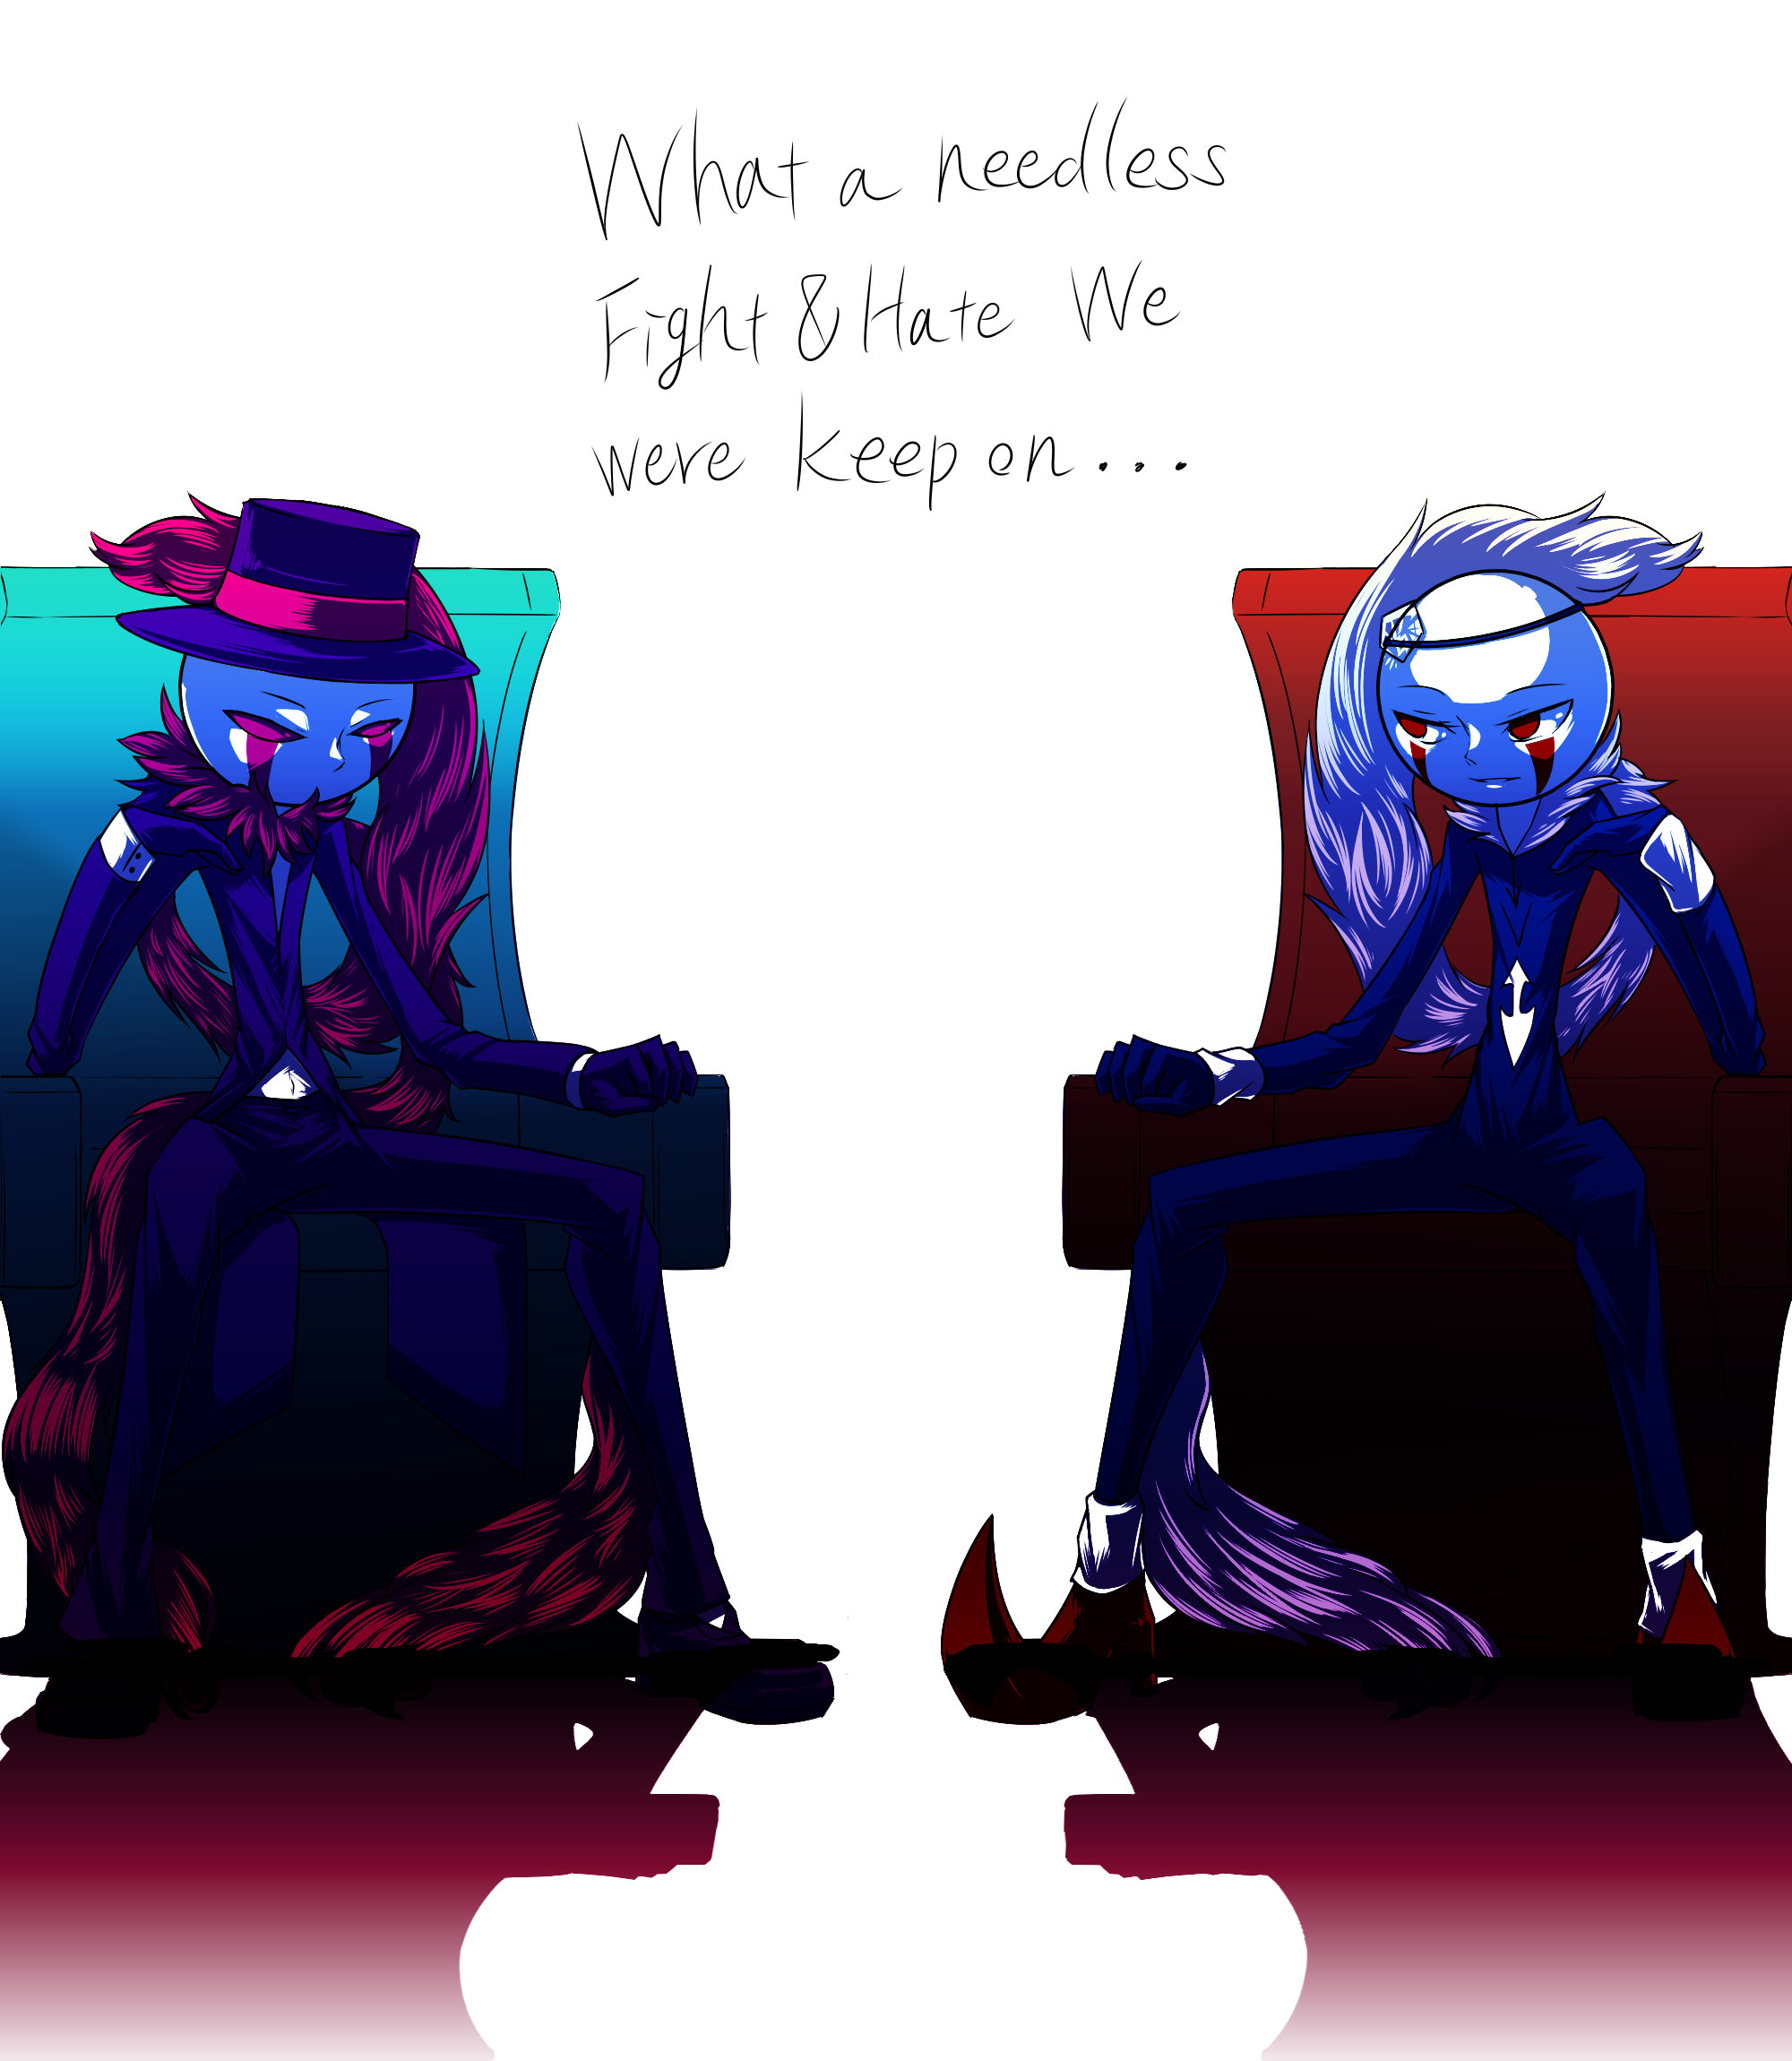 We needless